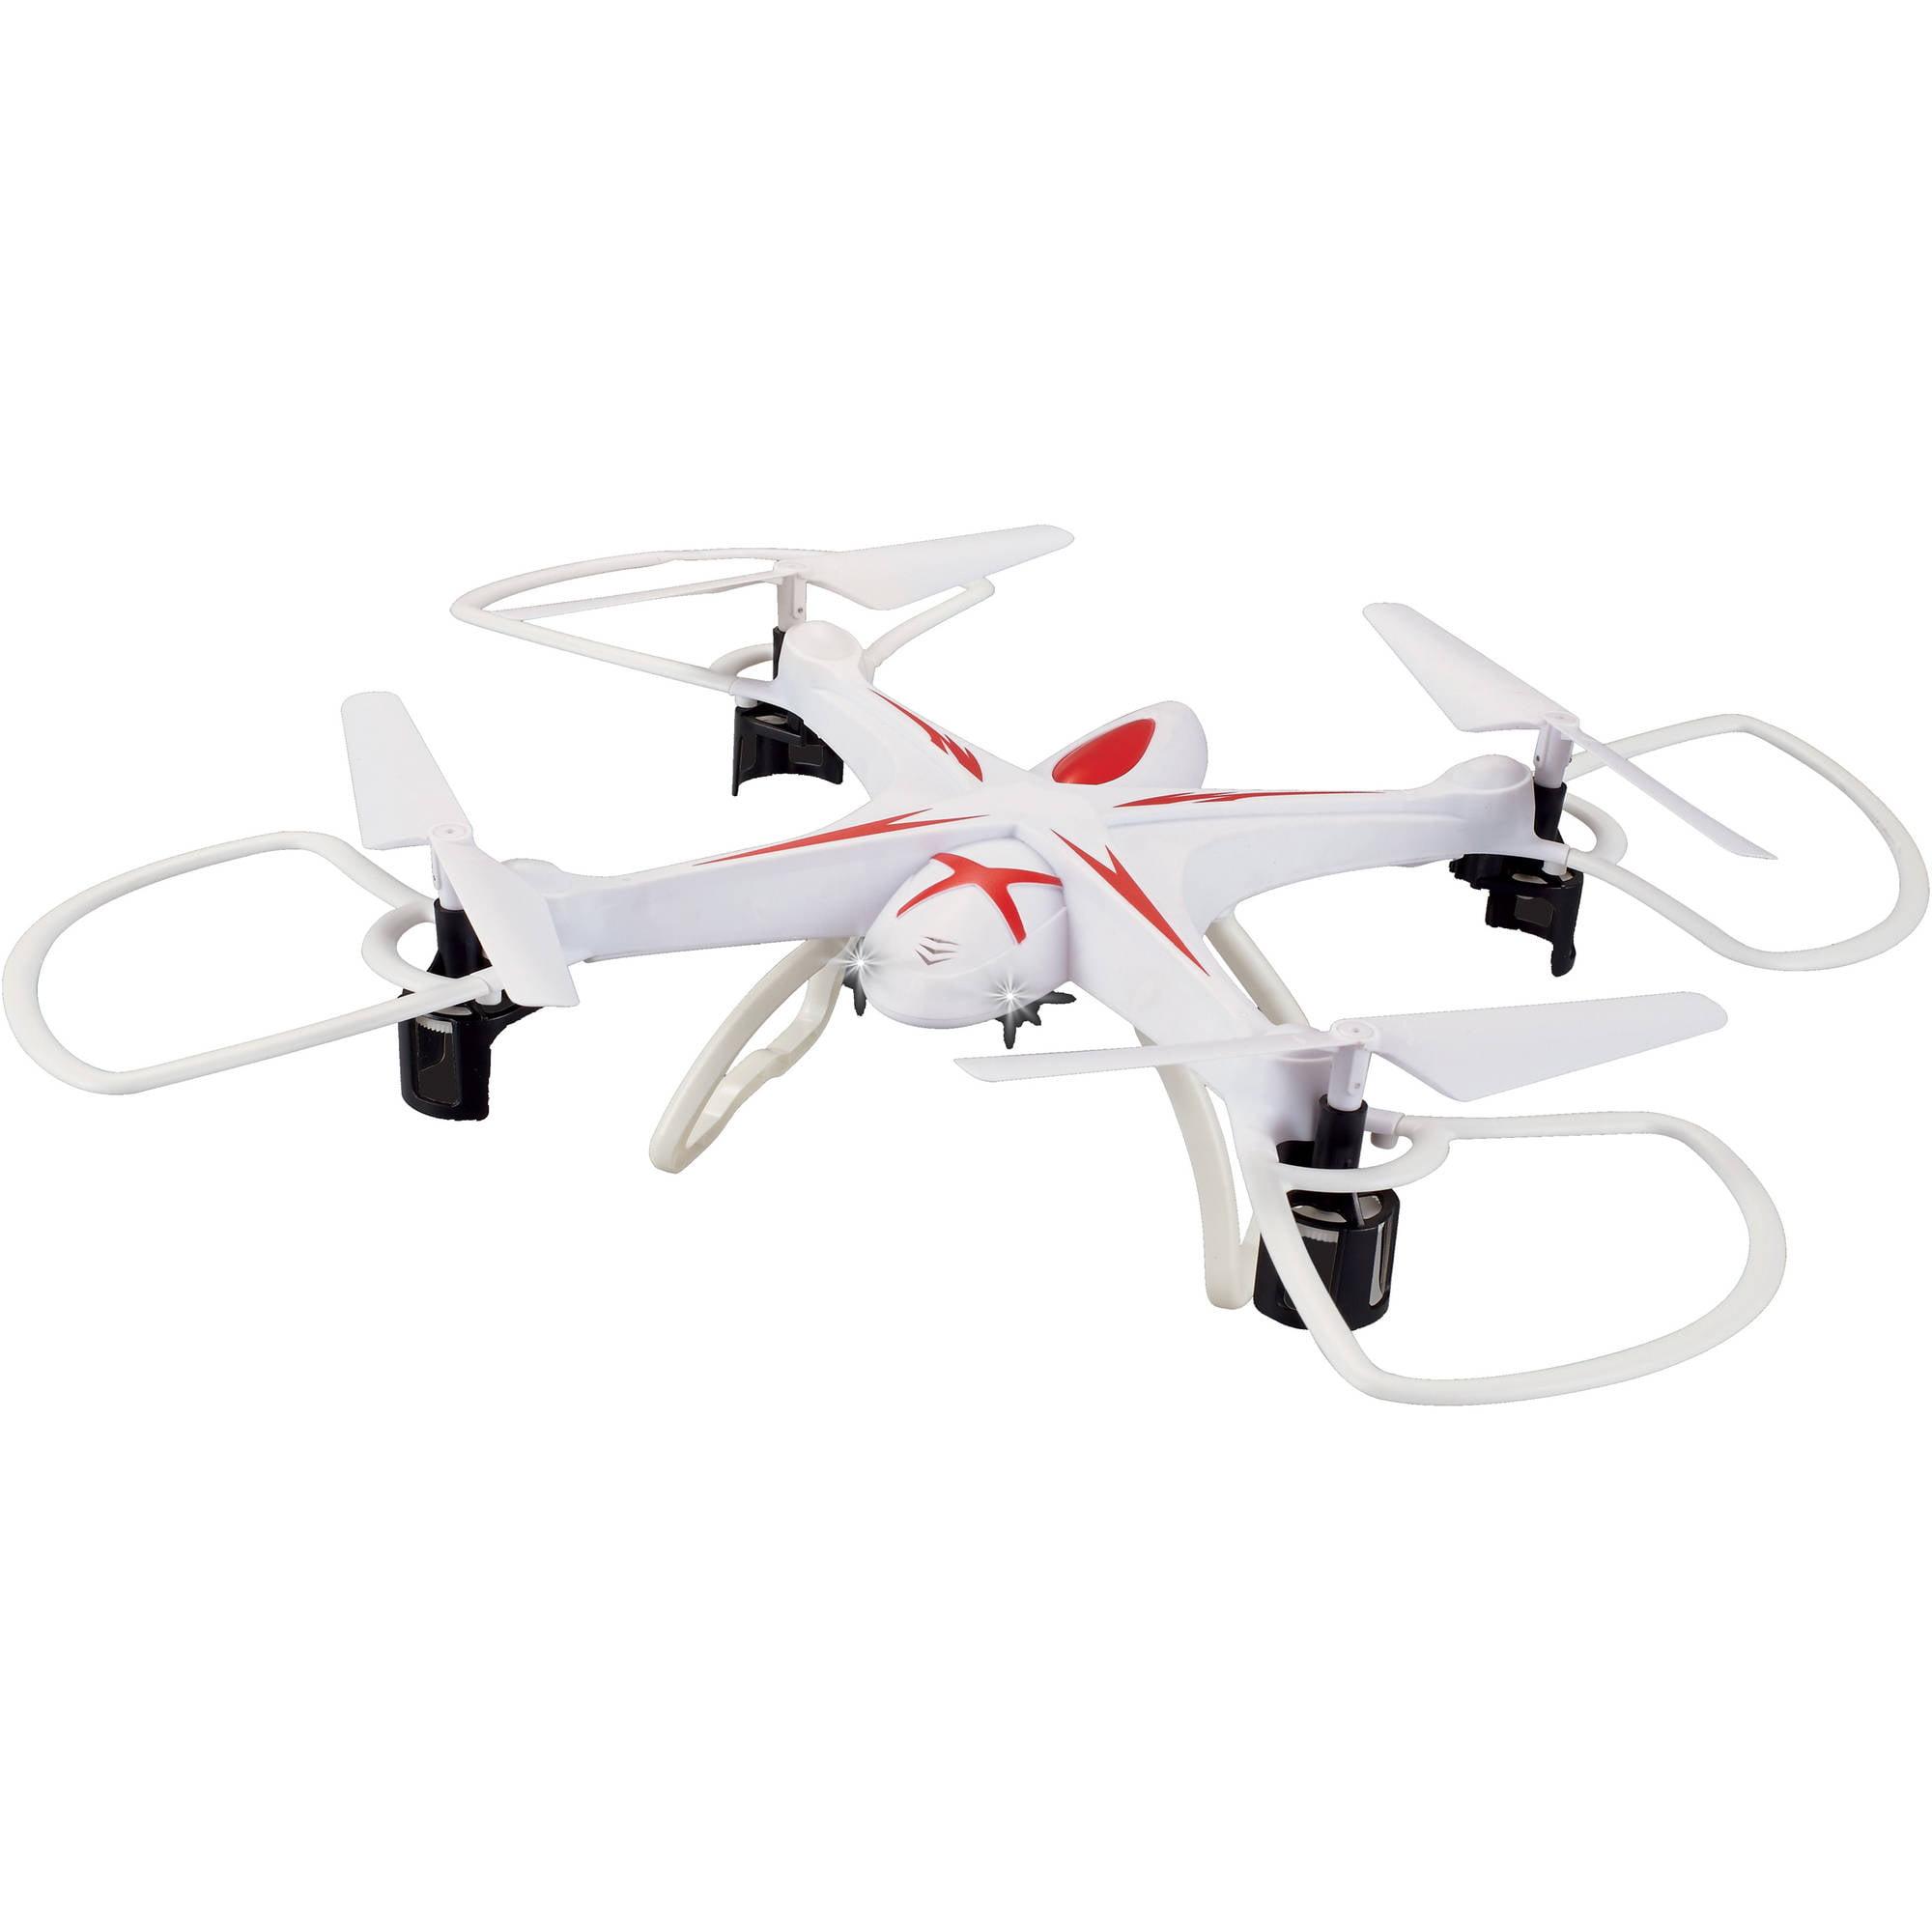 Braha Industries Inc. Aqua Drone 2.4 GHZ Waterproof RC QuadCopter